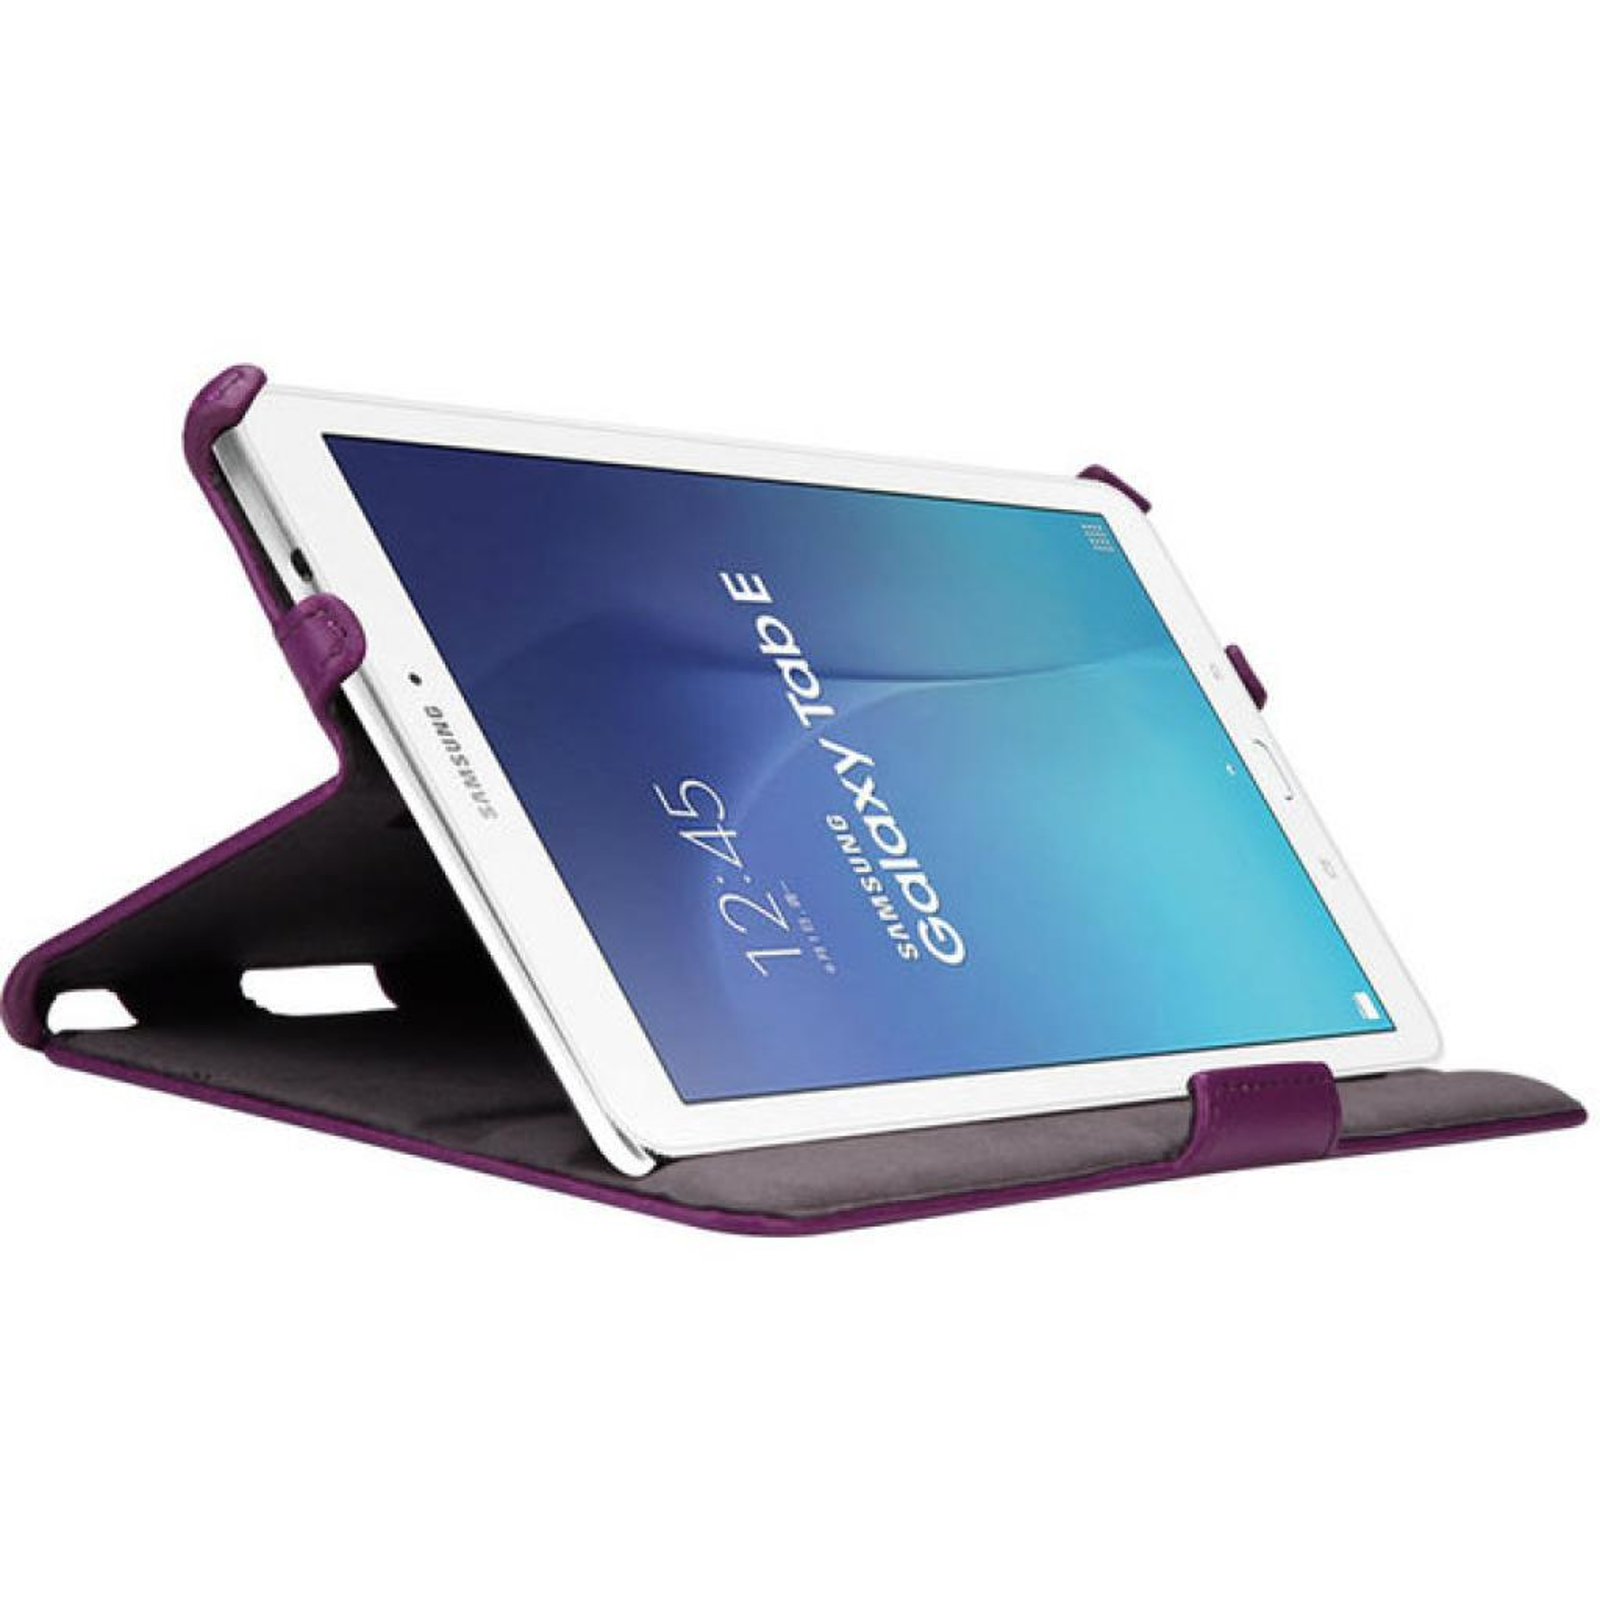 Чехол для планшета AirOn для Samsung Galaxy Tab E 9.6 vio (4822352776329) изображение 6